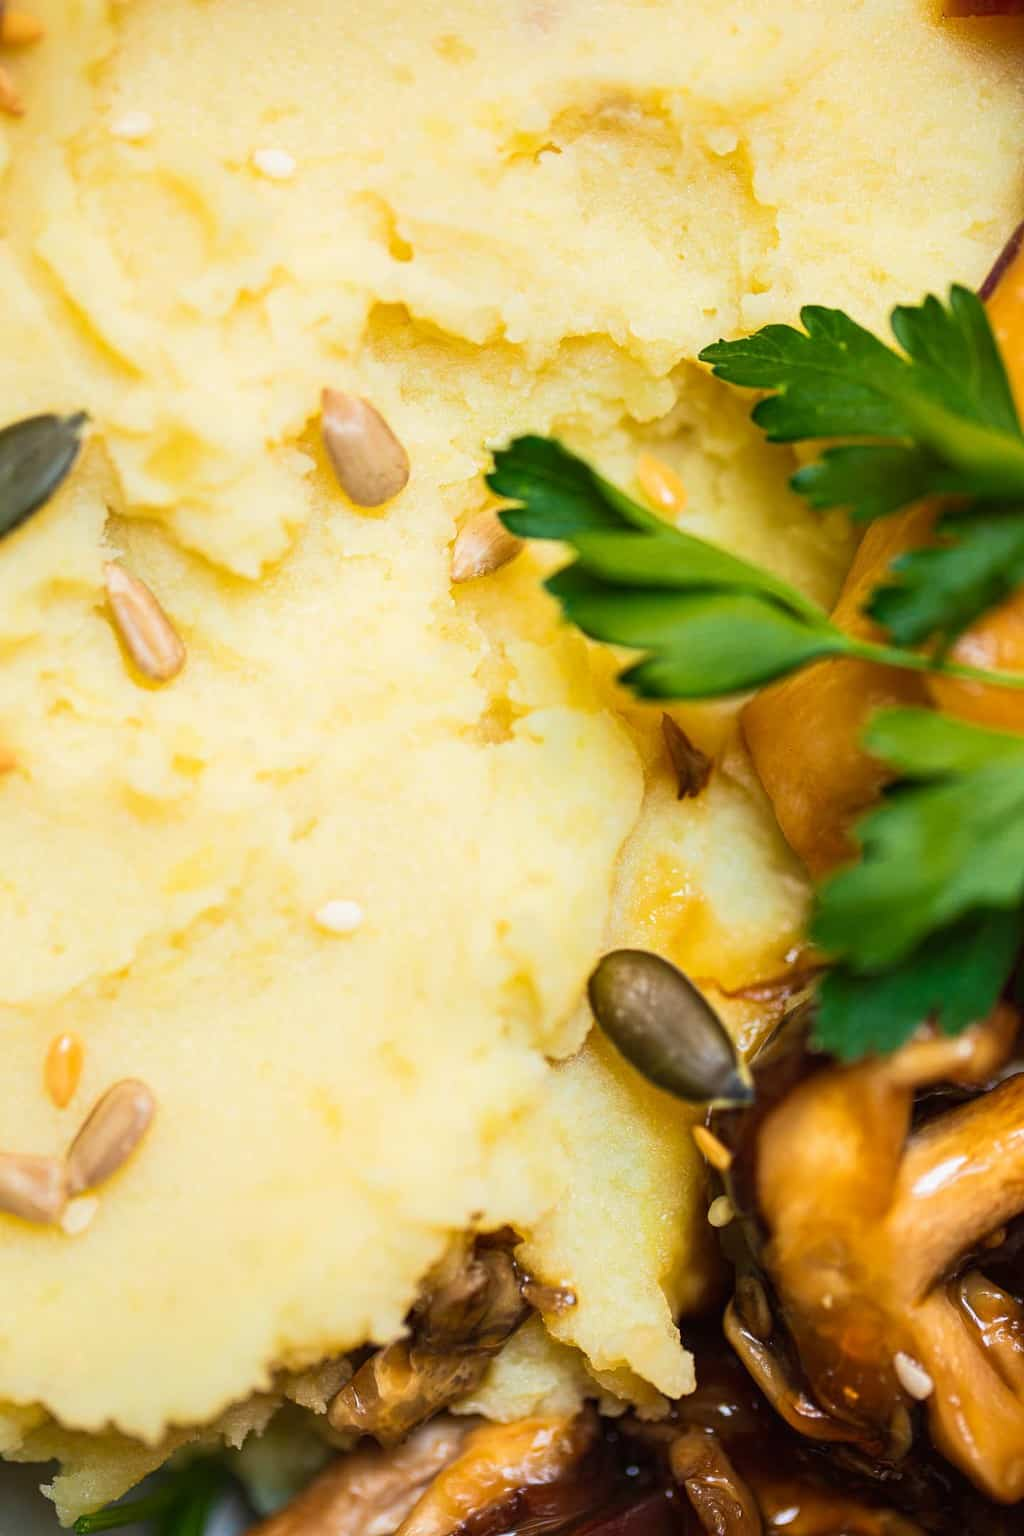 Closeup of potatoes and mushrooms